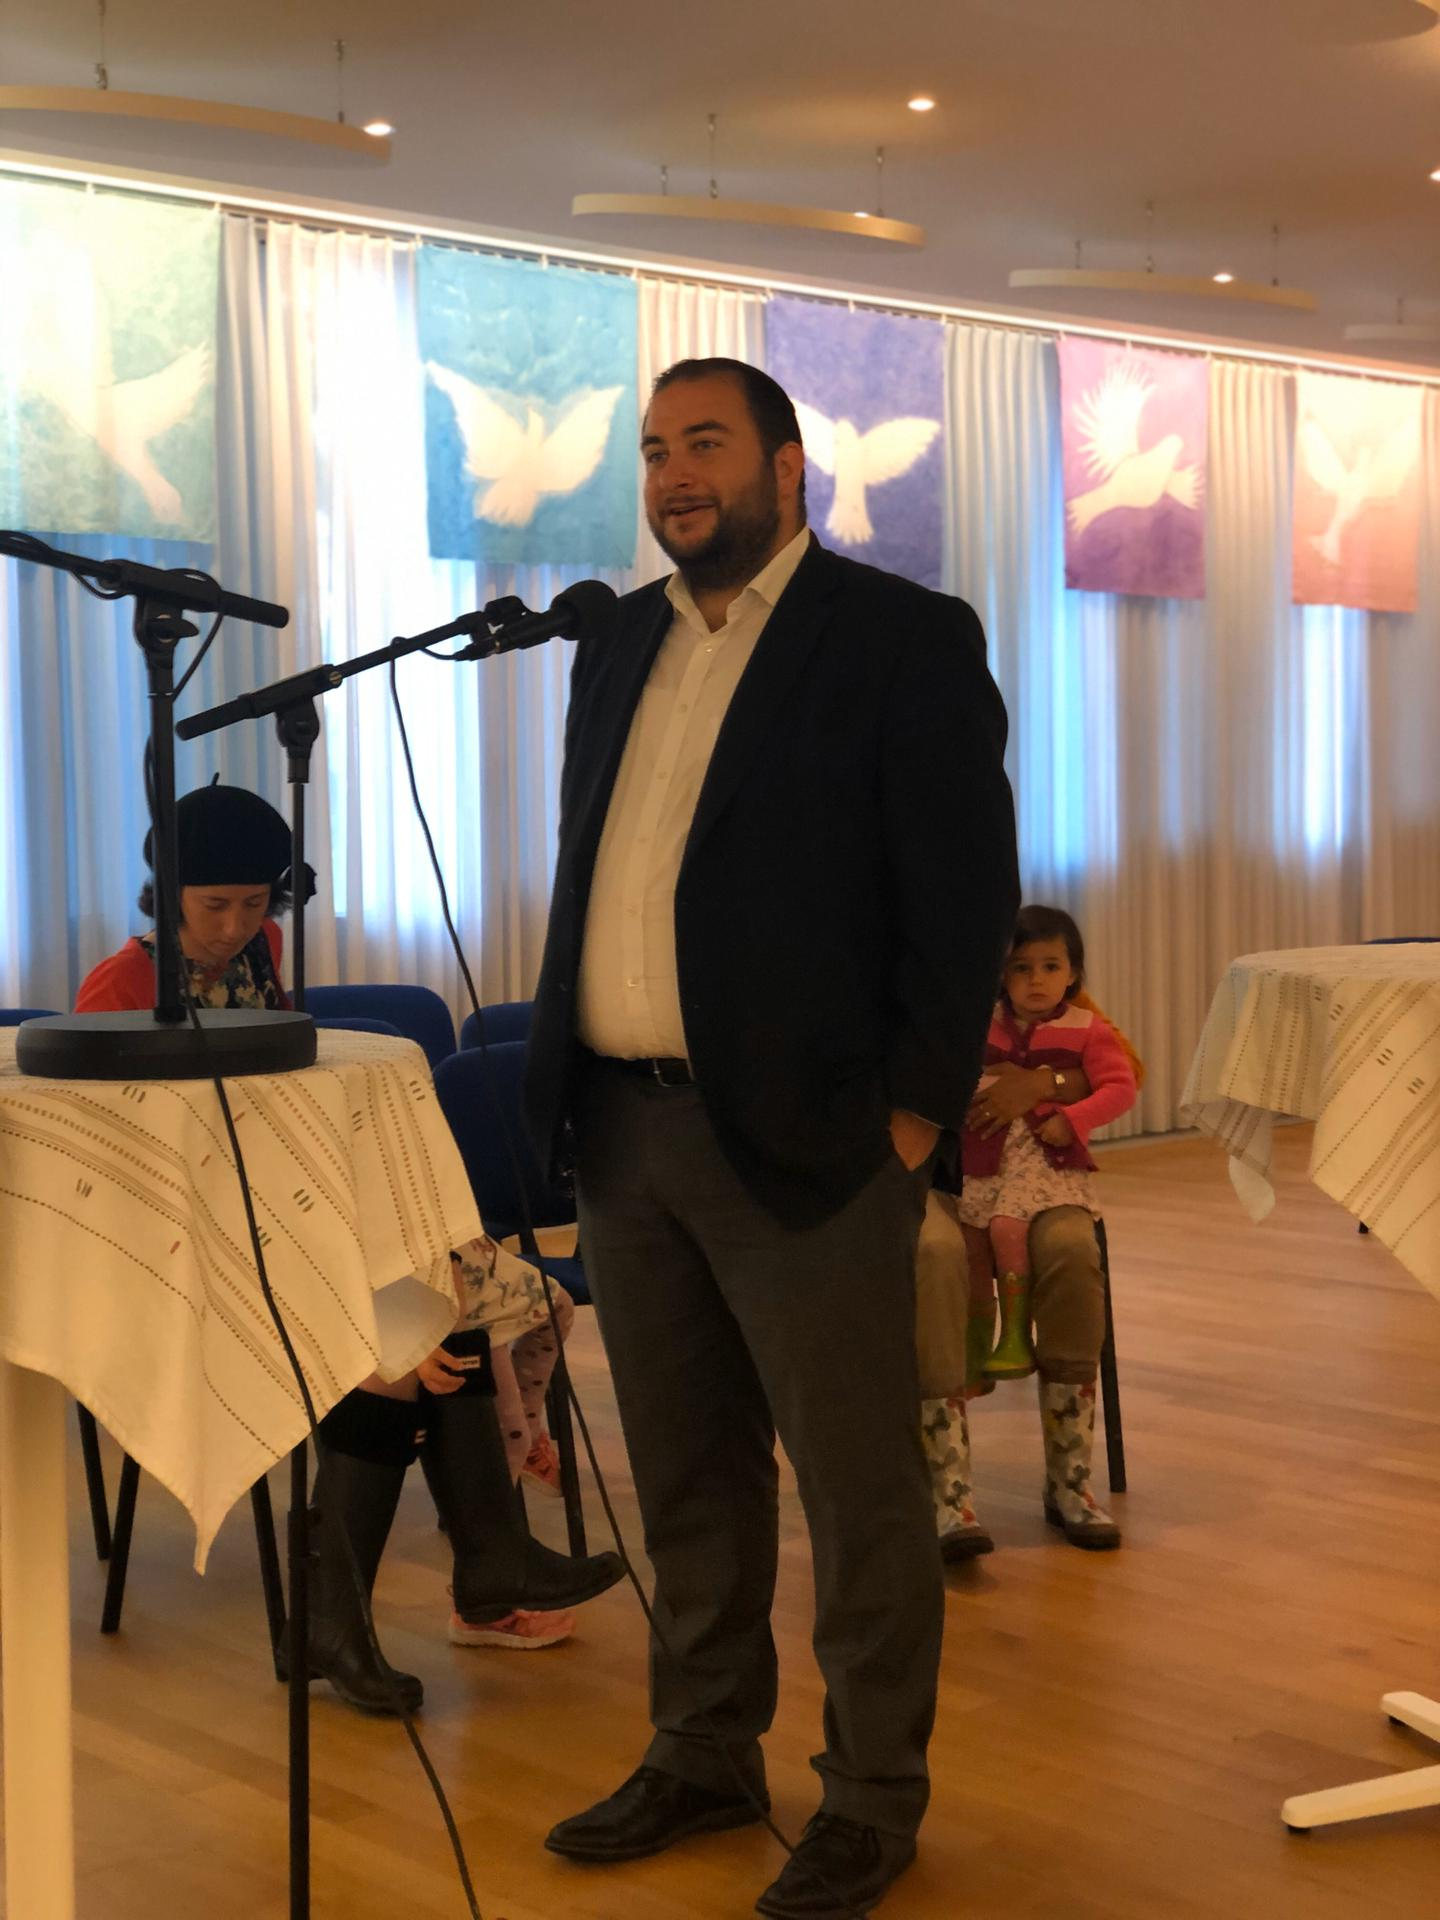 Rabbiner Michael Kohn - Haus der Religionen Bern